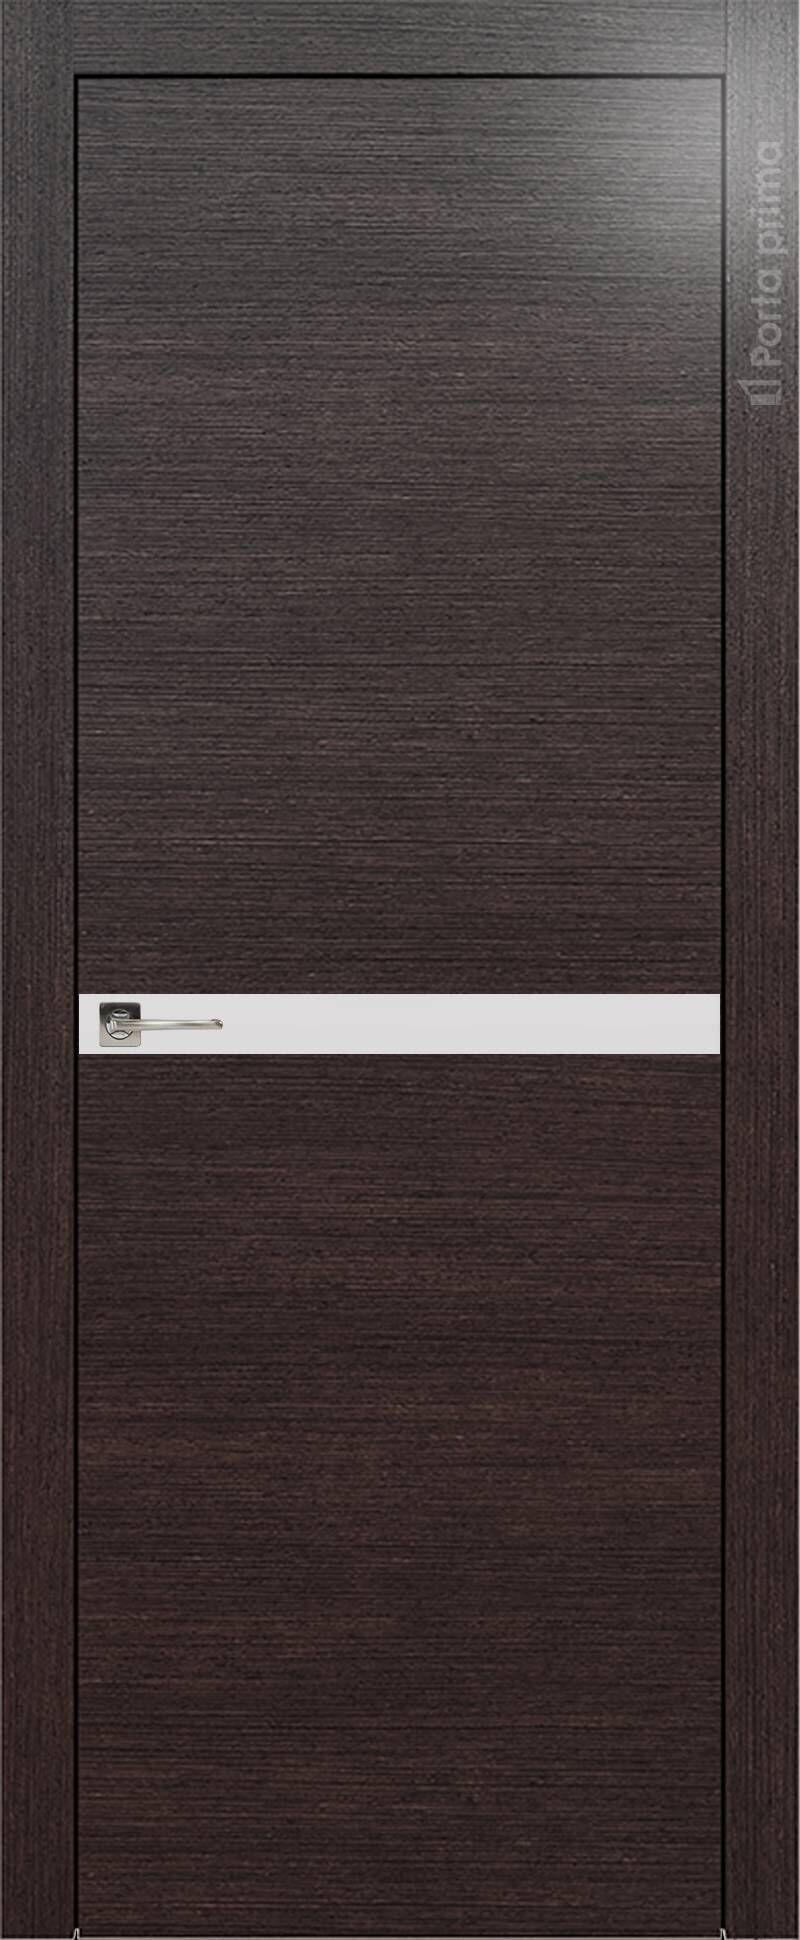 Tivoli Б-4 цвет - Венге Шоколад Без стекла (ДГ)